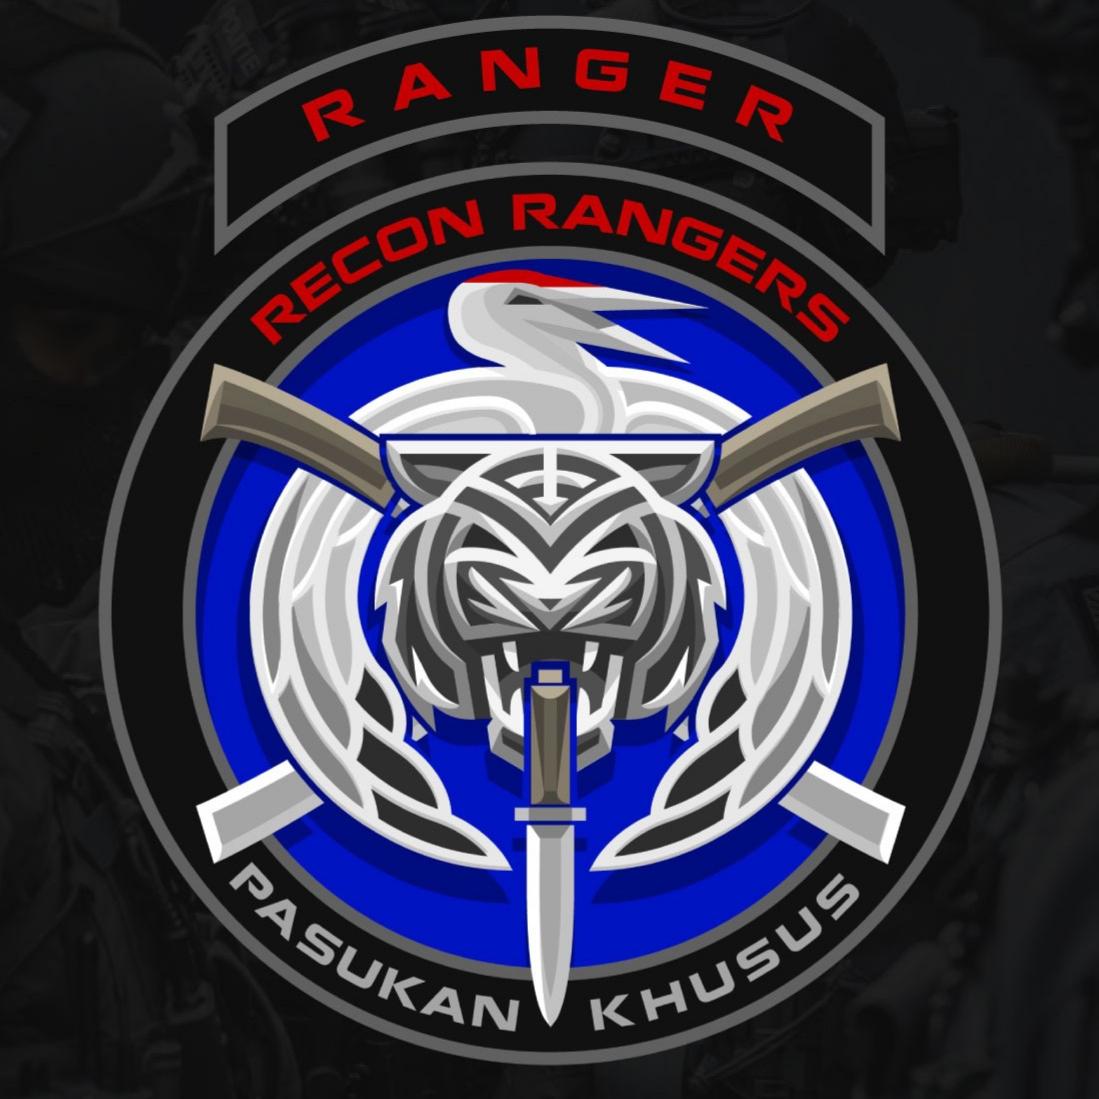 Recon Rangers Biru logo